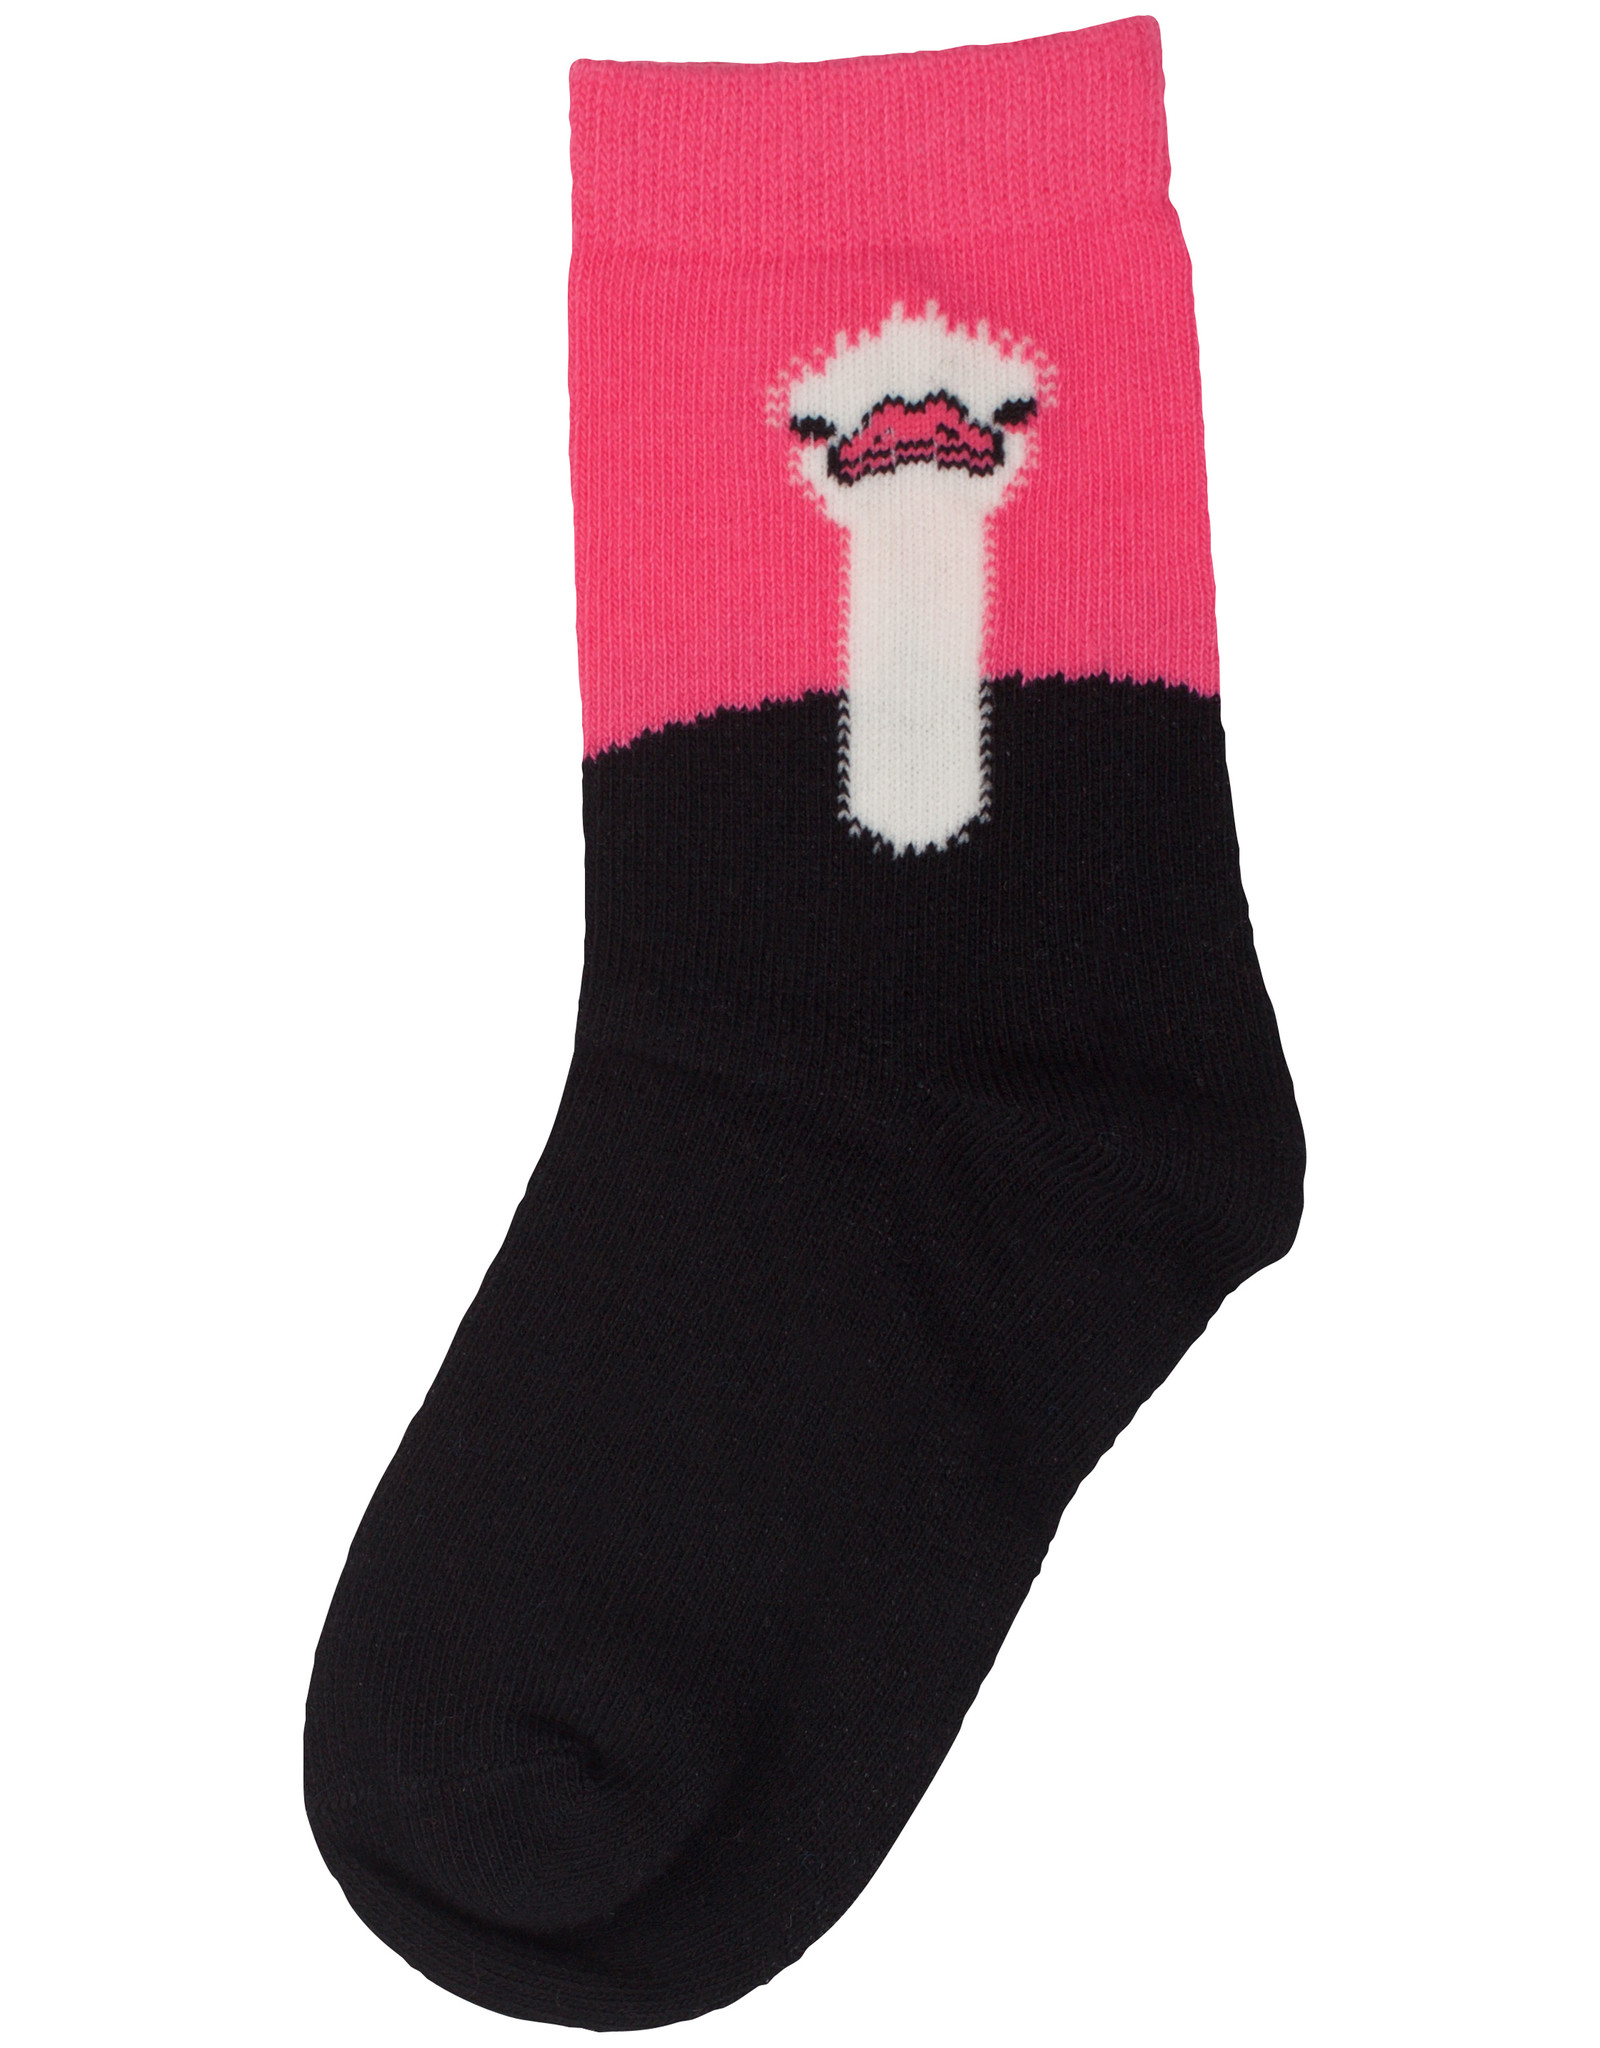 Danefae Children's socks - Ostrich